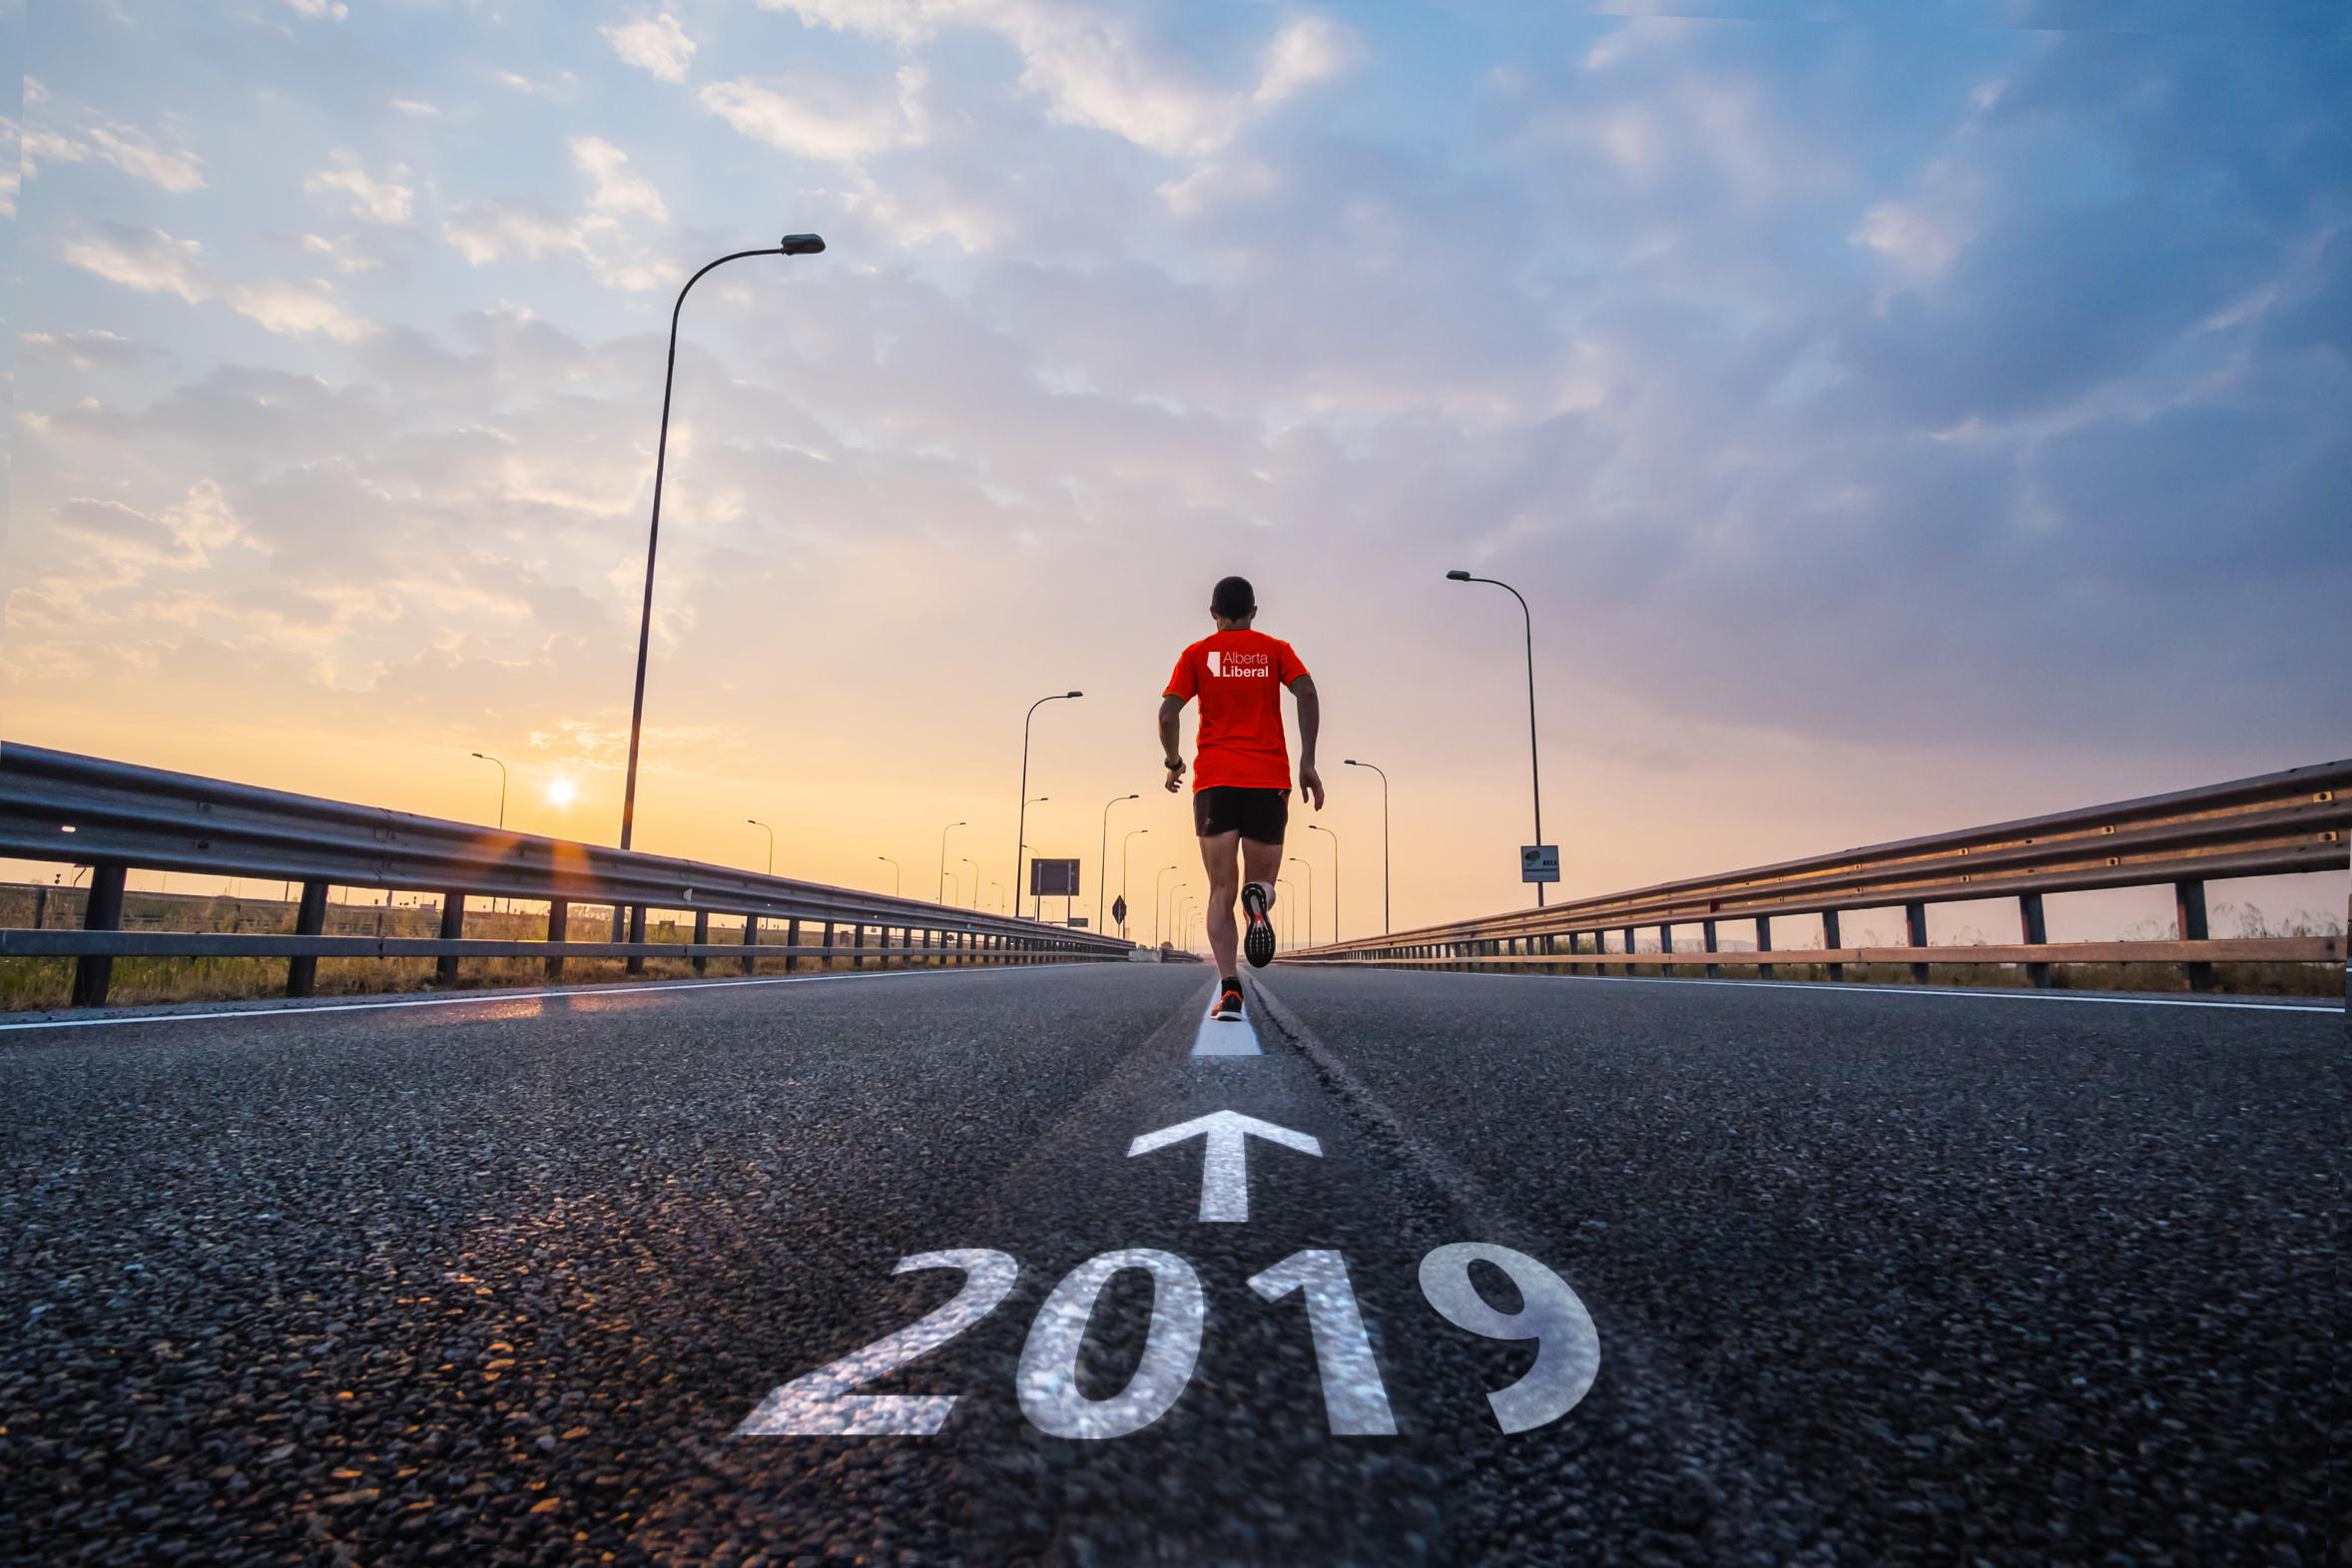 Future_2019.jpg